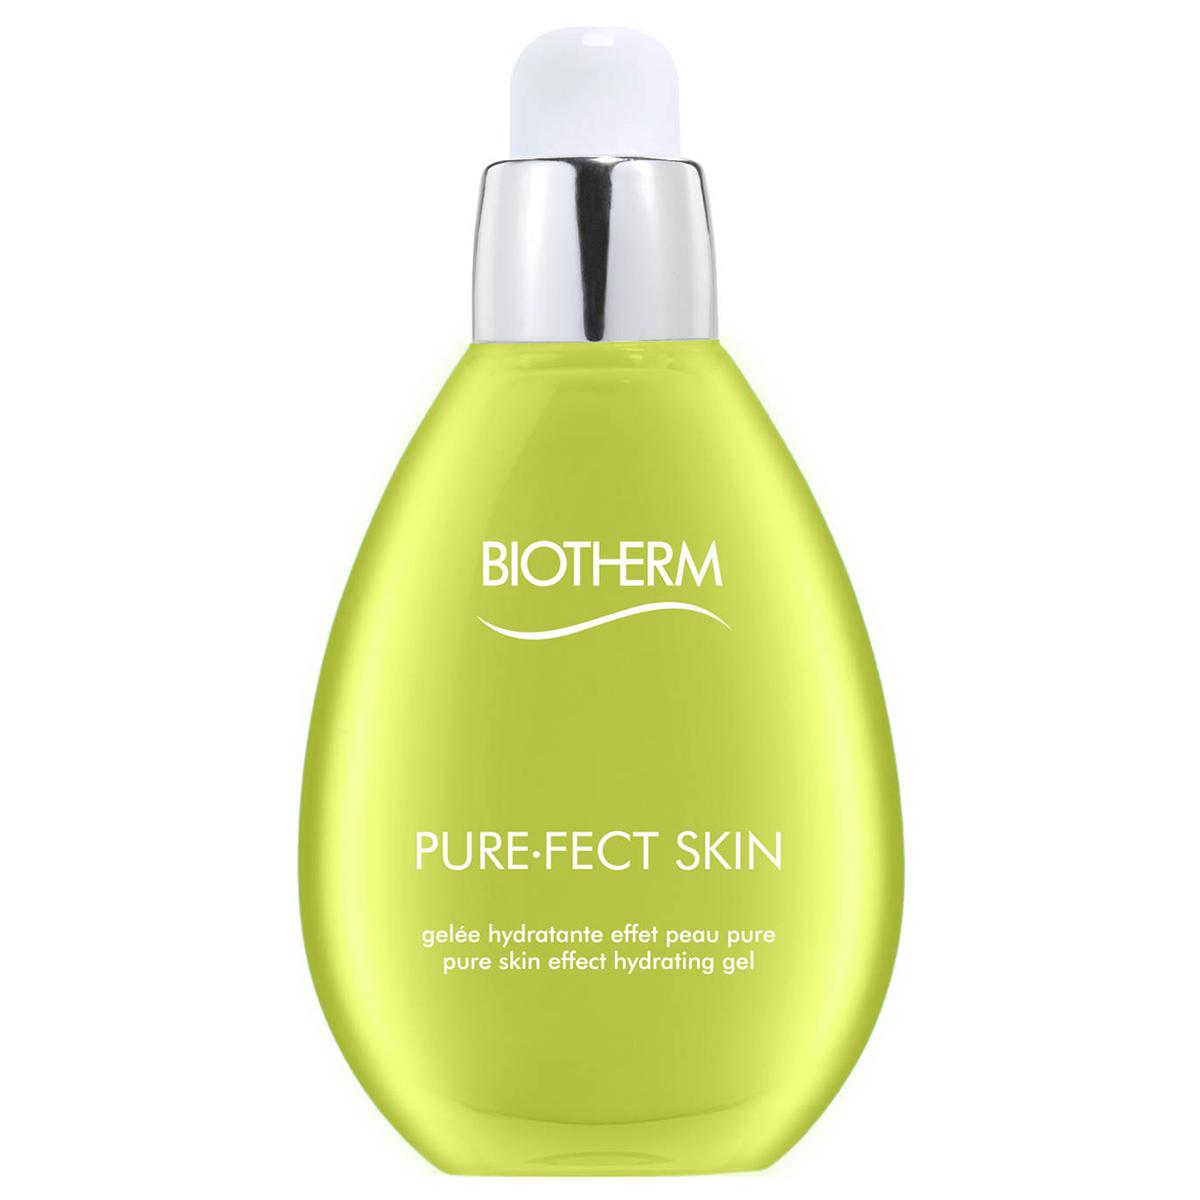 Biotherm - Purefect Skin - Gelée hydratante 50 ml